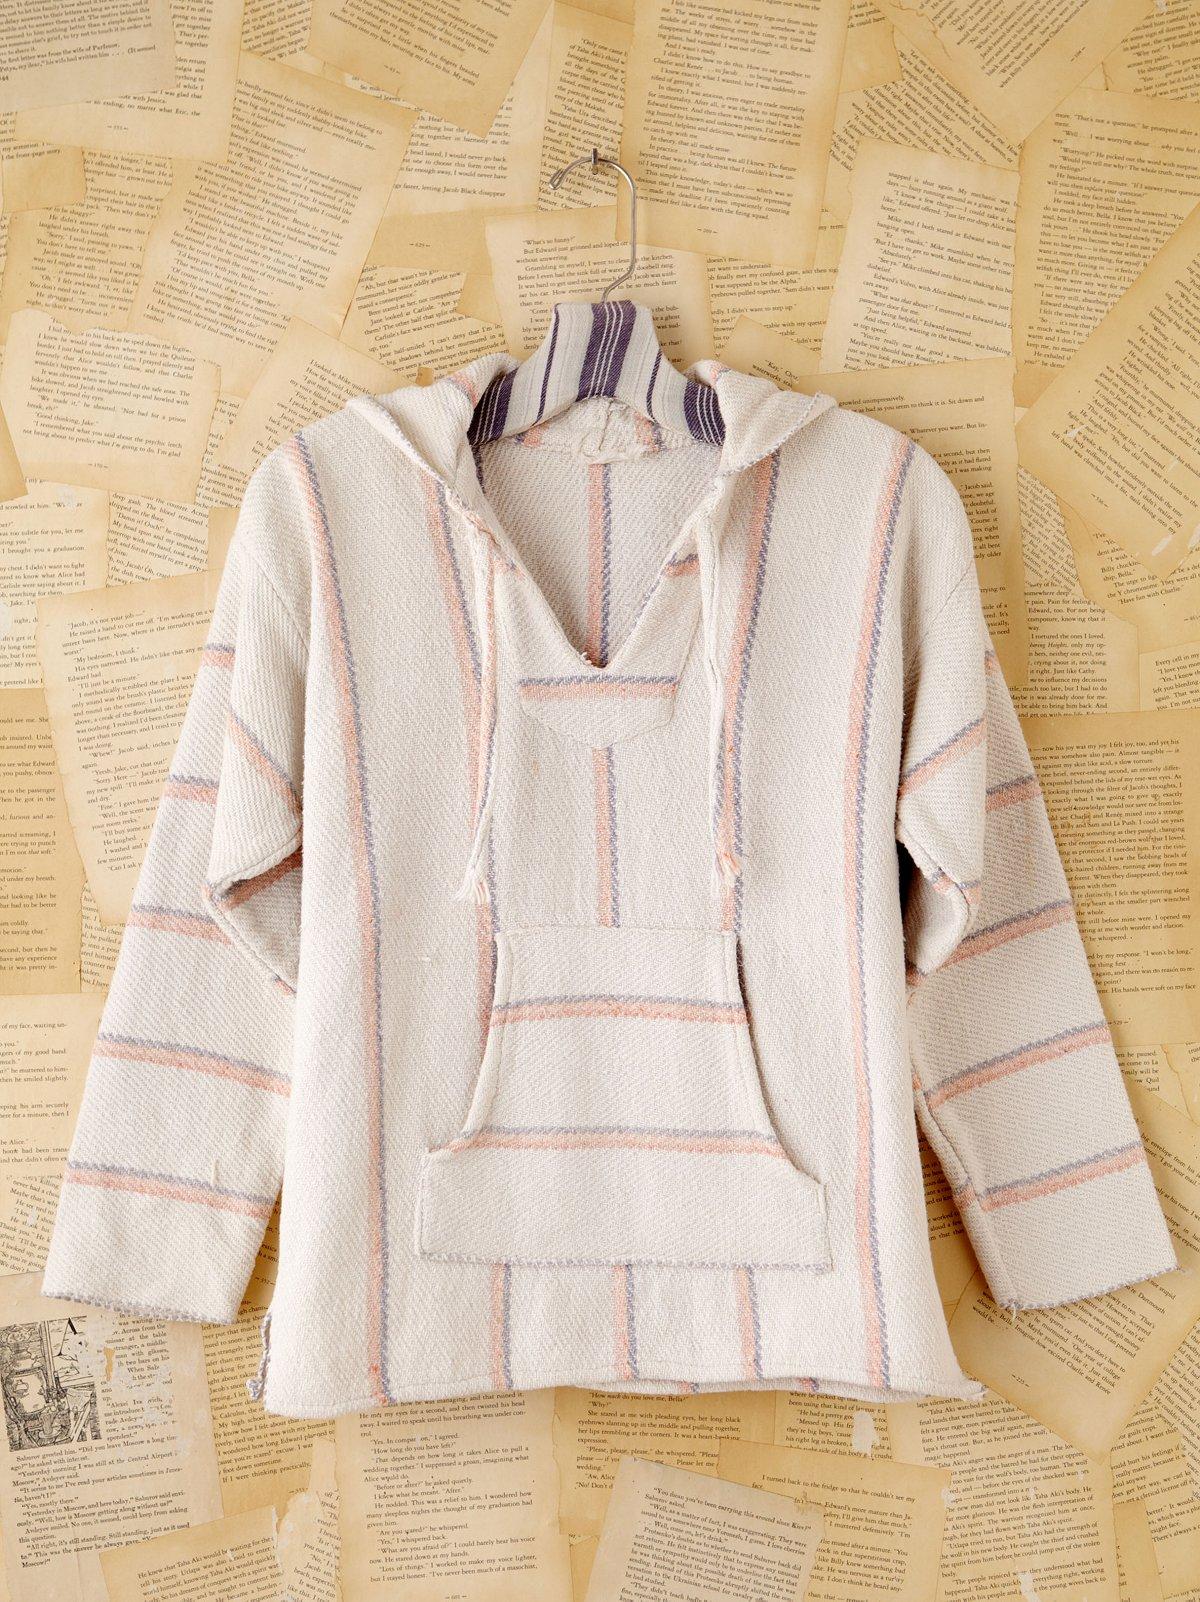 Vintage Woven Blanket Hooded Pullover